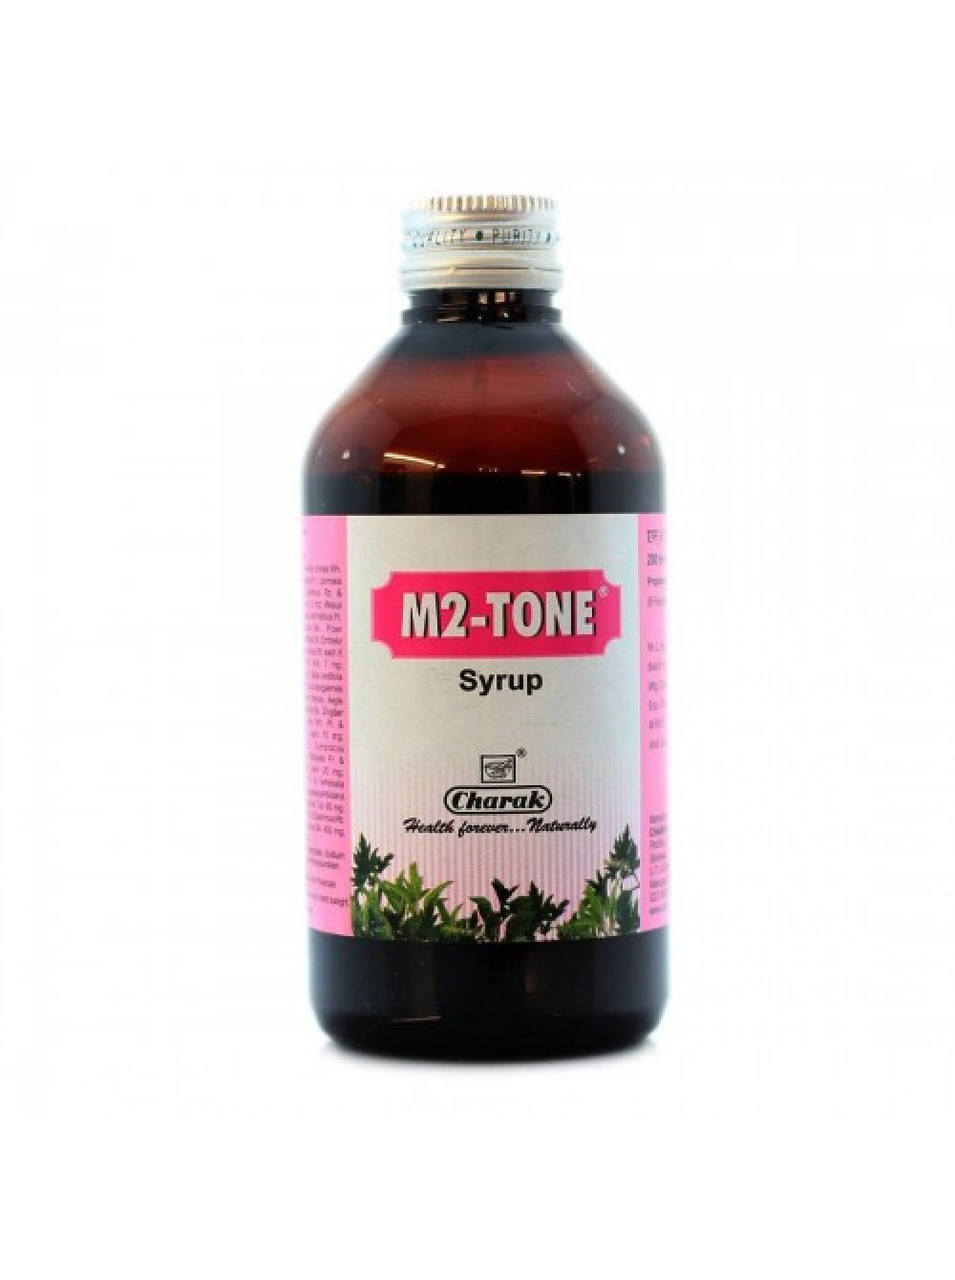 Сироп М2-Тон для женского здоровья, 200 мл, Чарак; M2-Tone Syrup, 200 ml, Charak